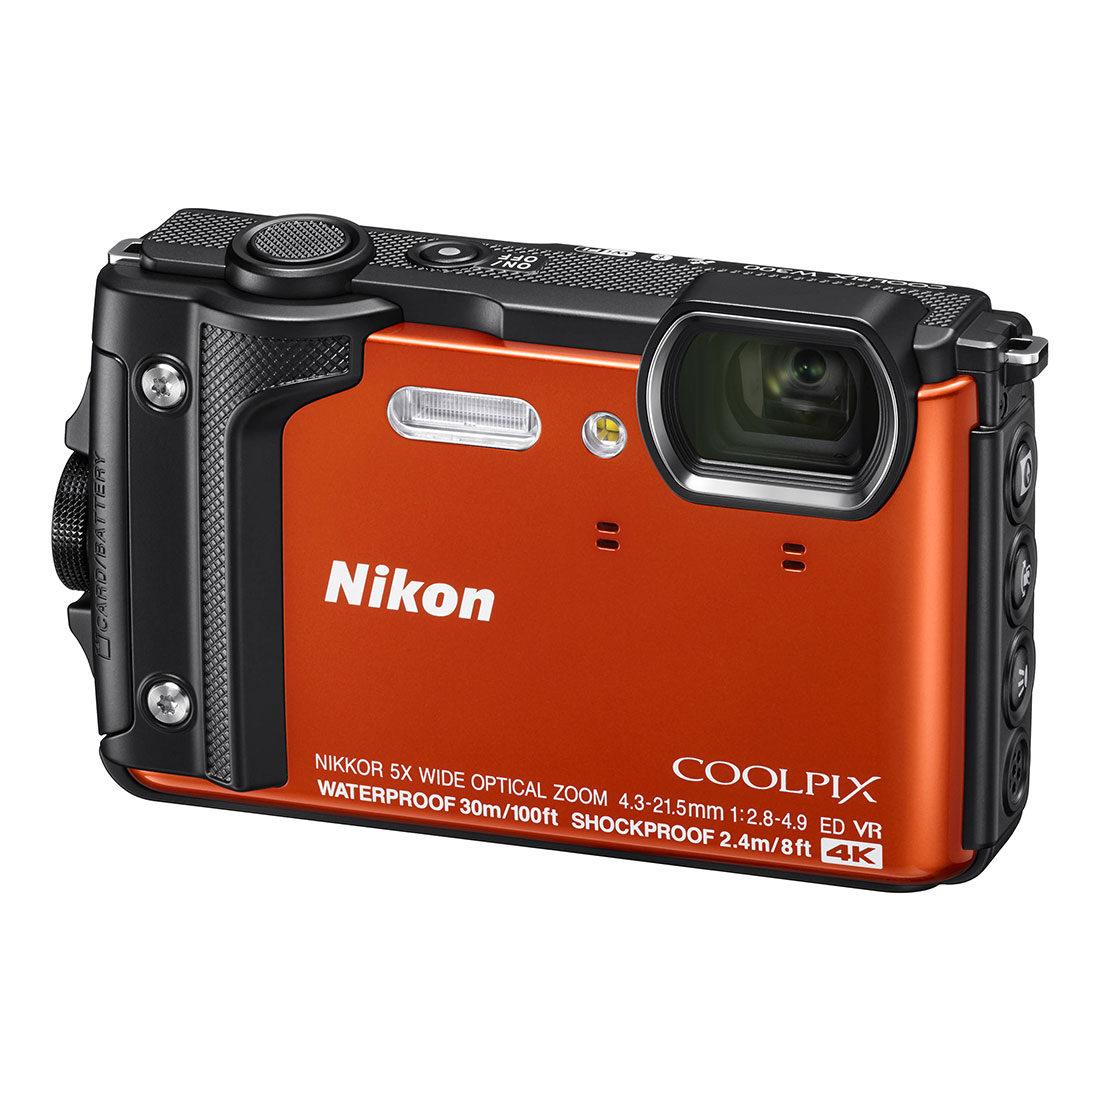 Nikon Coolpix W300 compact camera Oranje